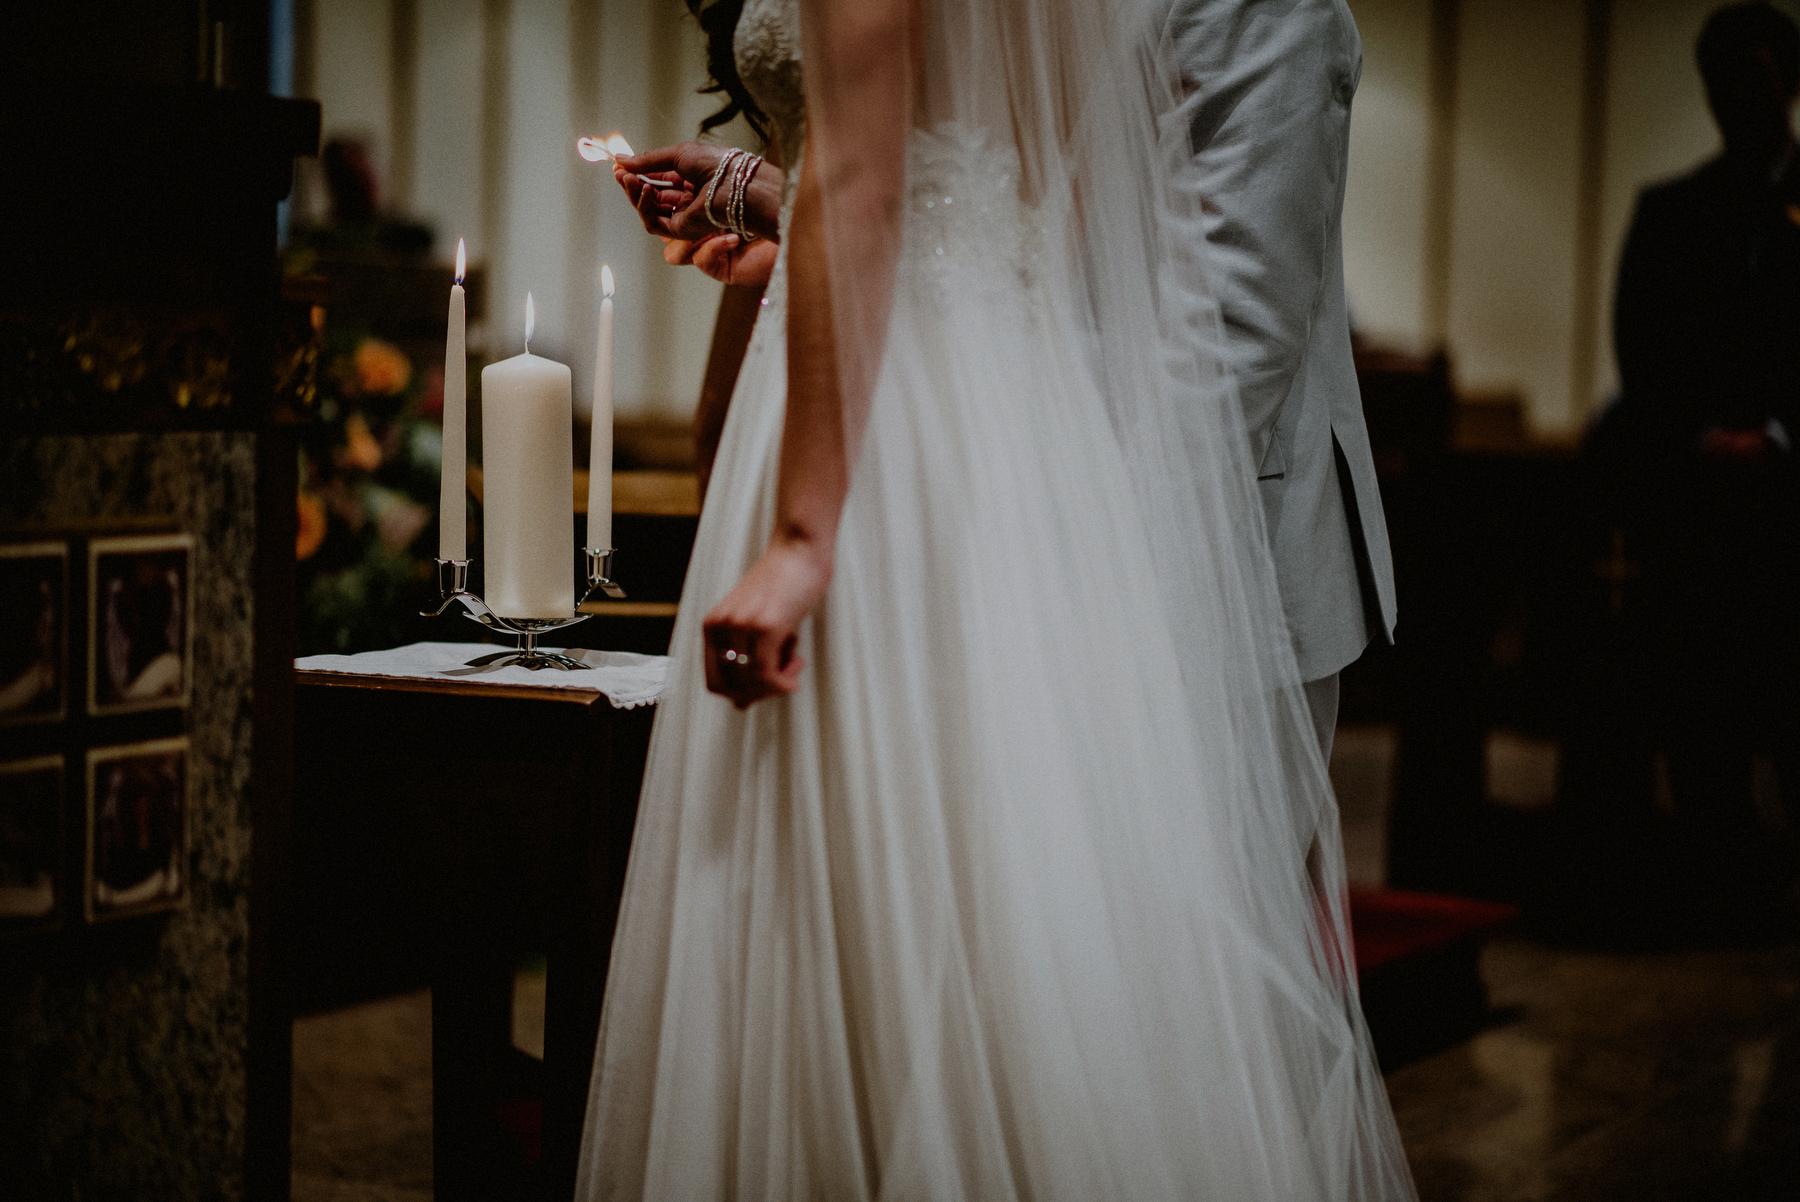 intimate wedding photos